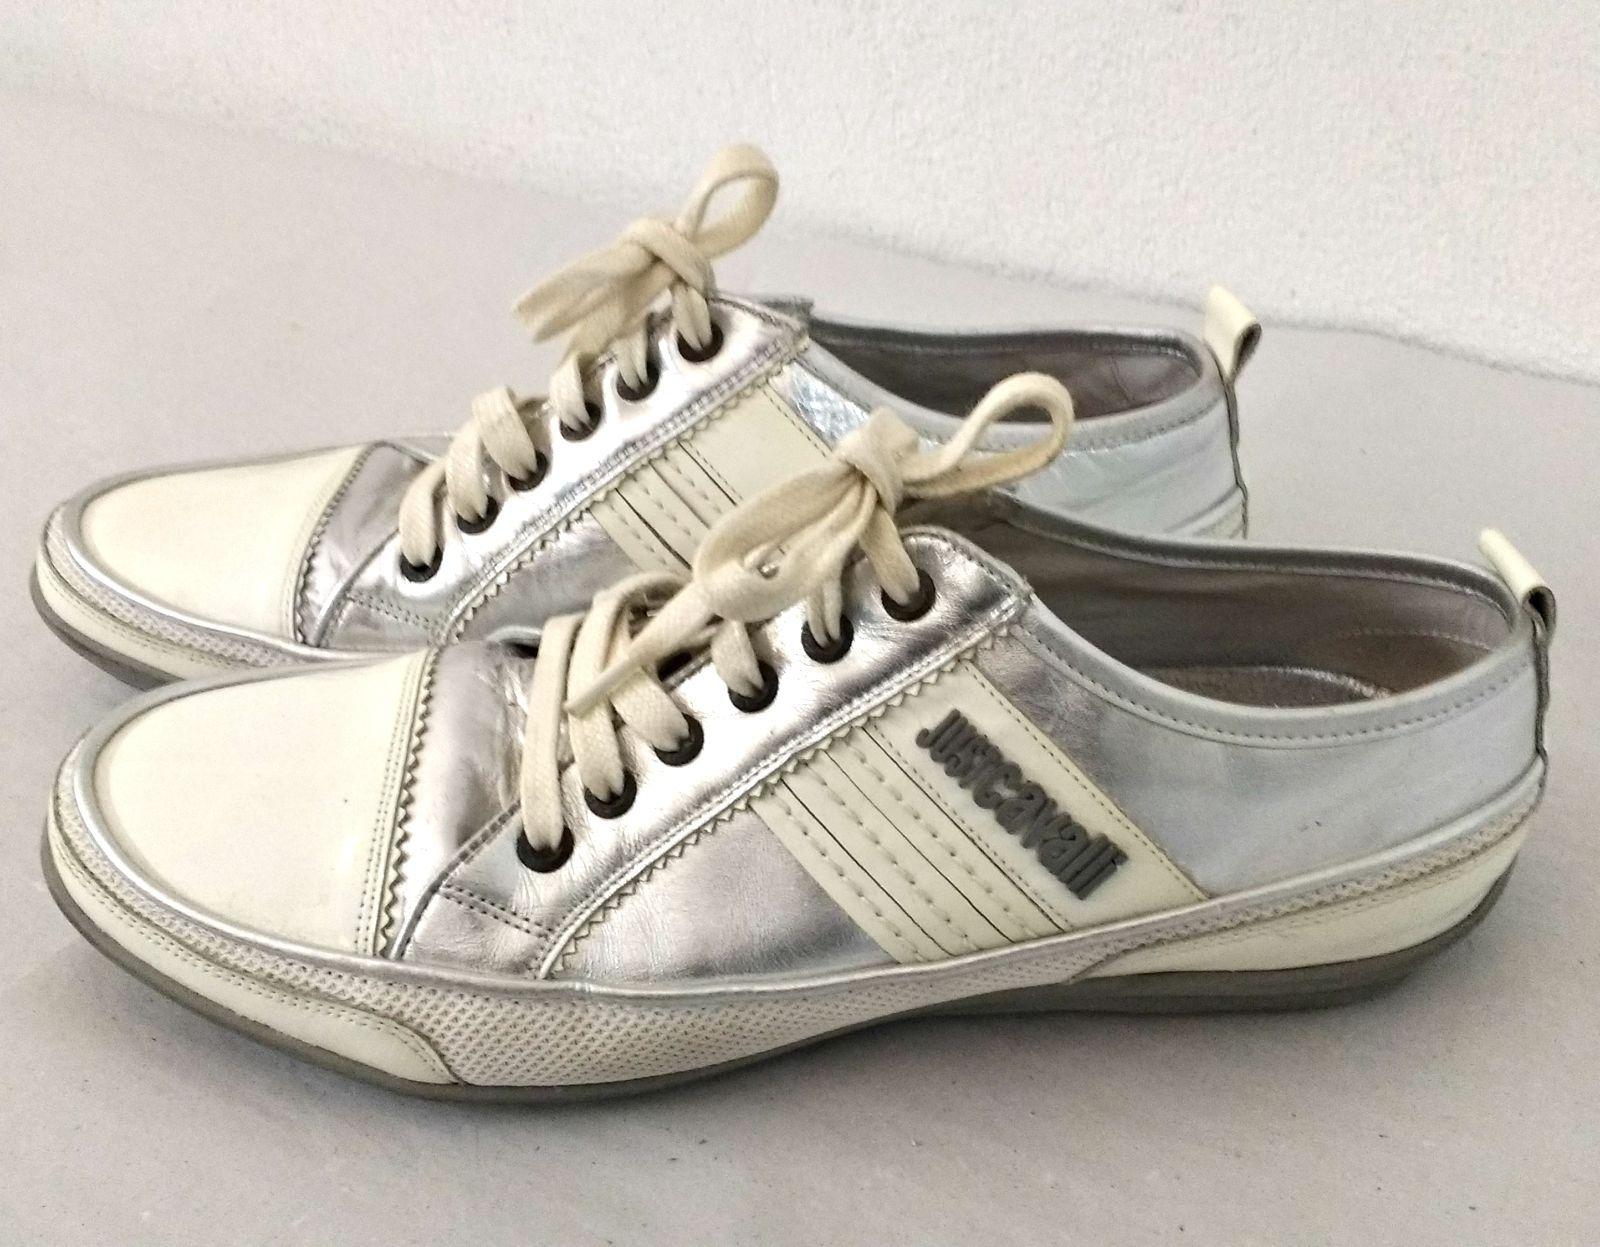 size 40 544a2 65e00 CAVALLI Herrenschuhe Gr 43 Designer Sneaker Sneaks Herren ...